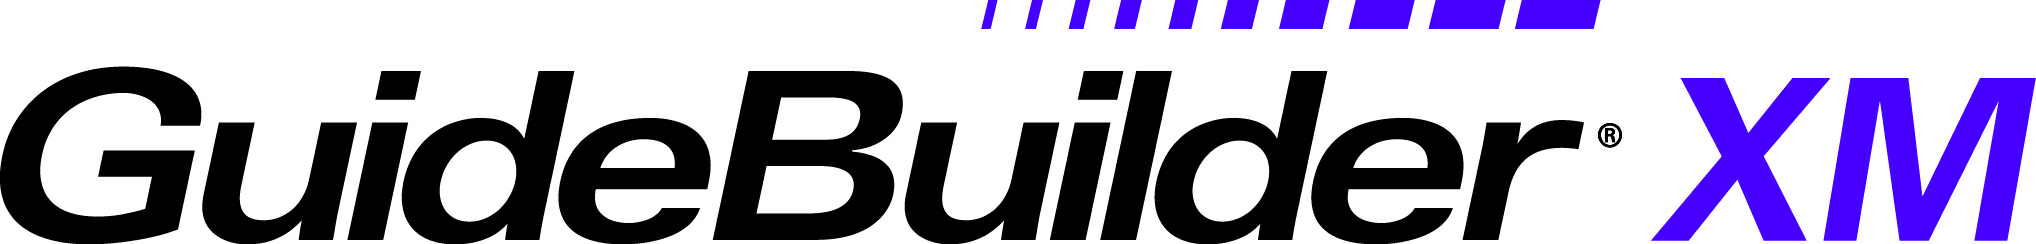 GuideBuilder® XM ATSC 3 0 Generator and Encoder | Triveni